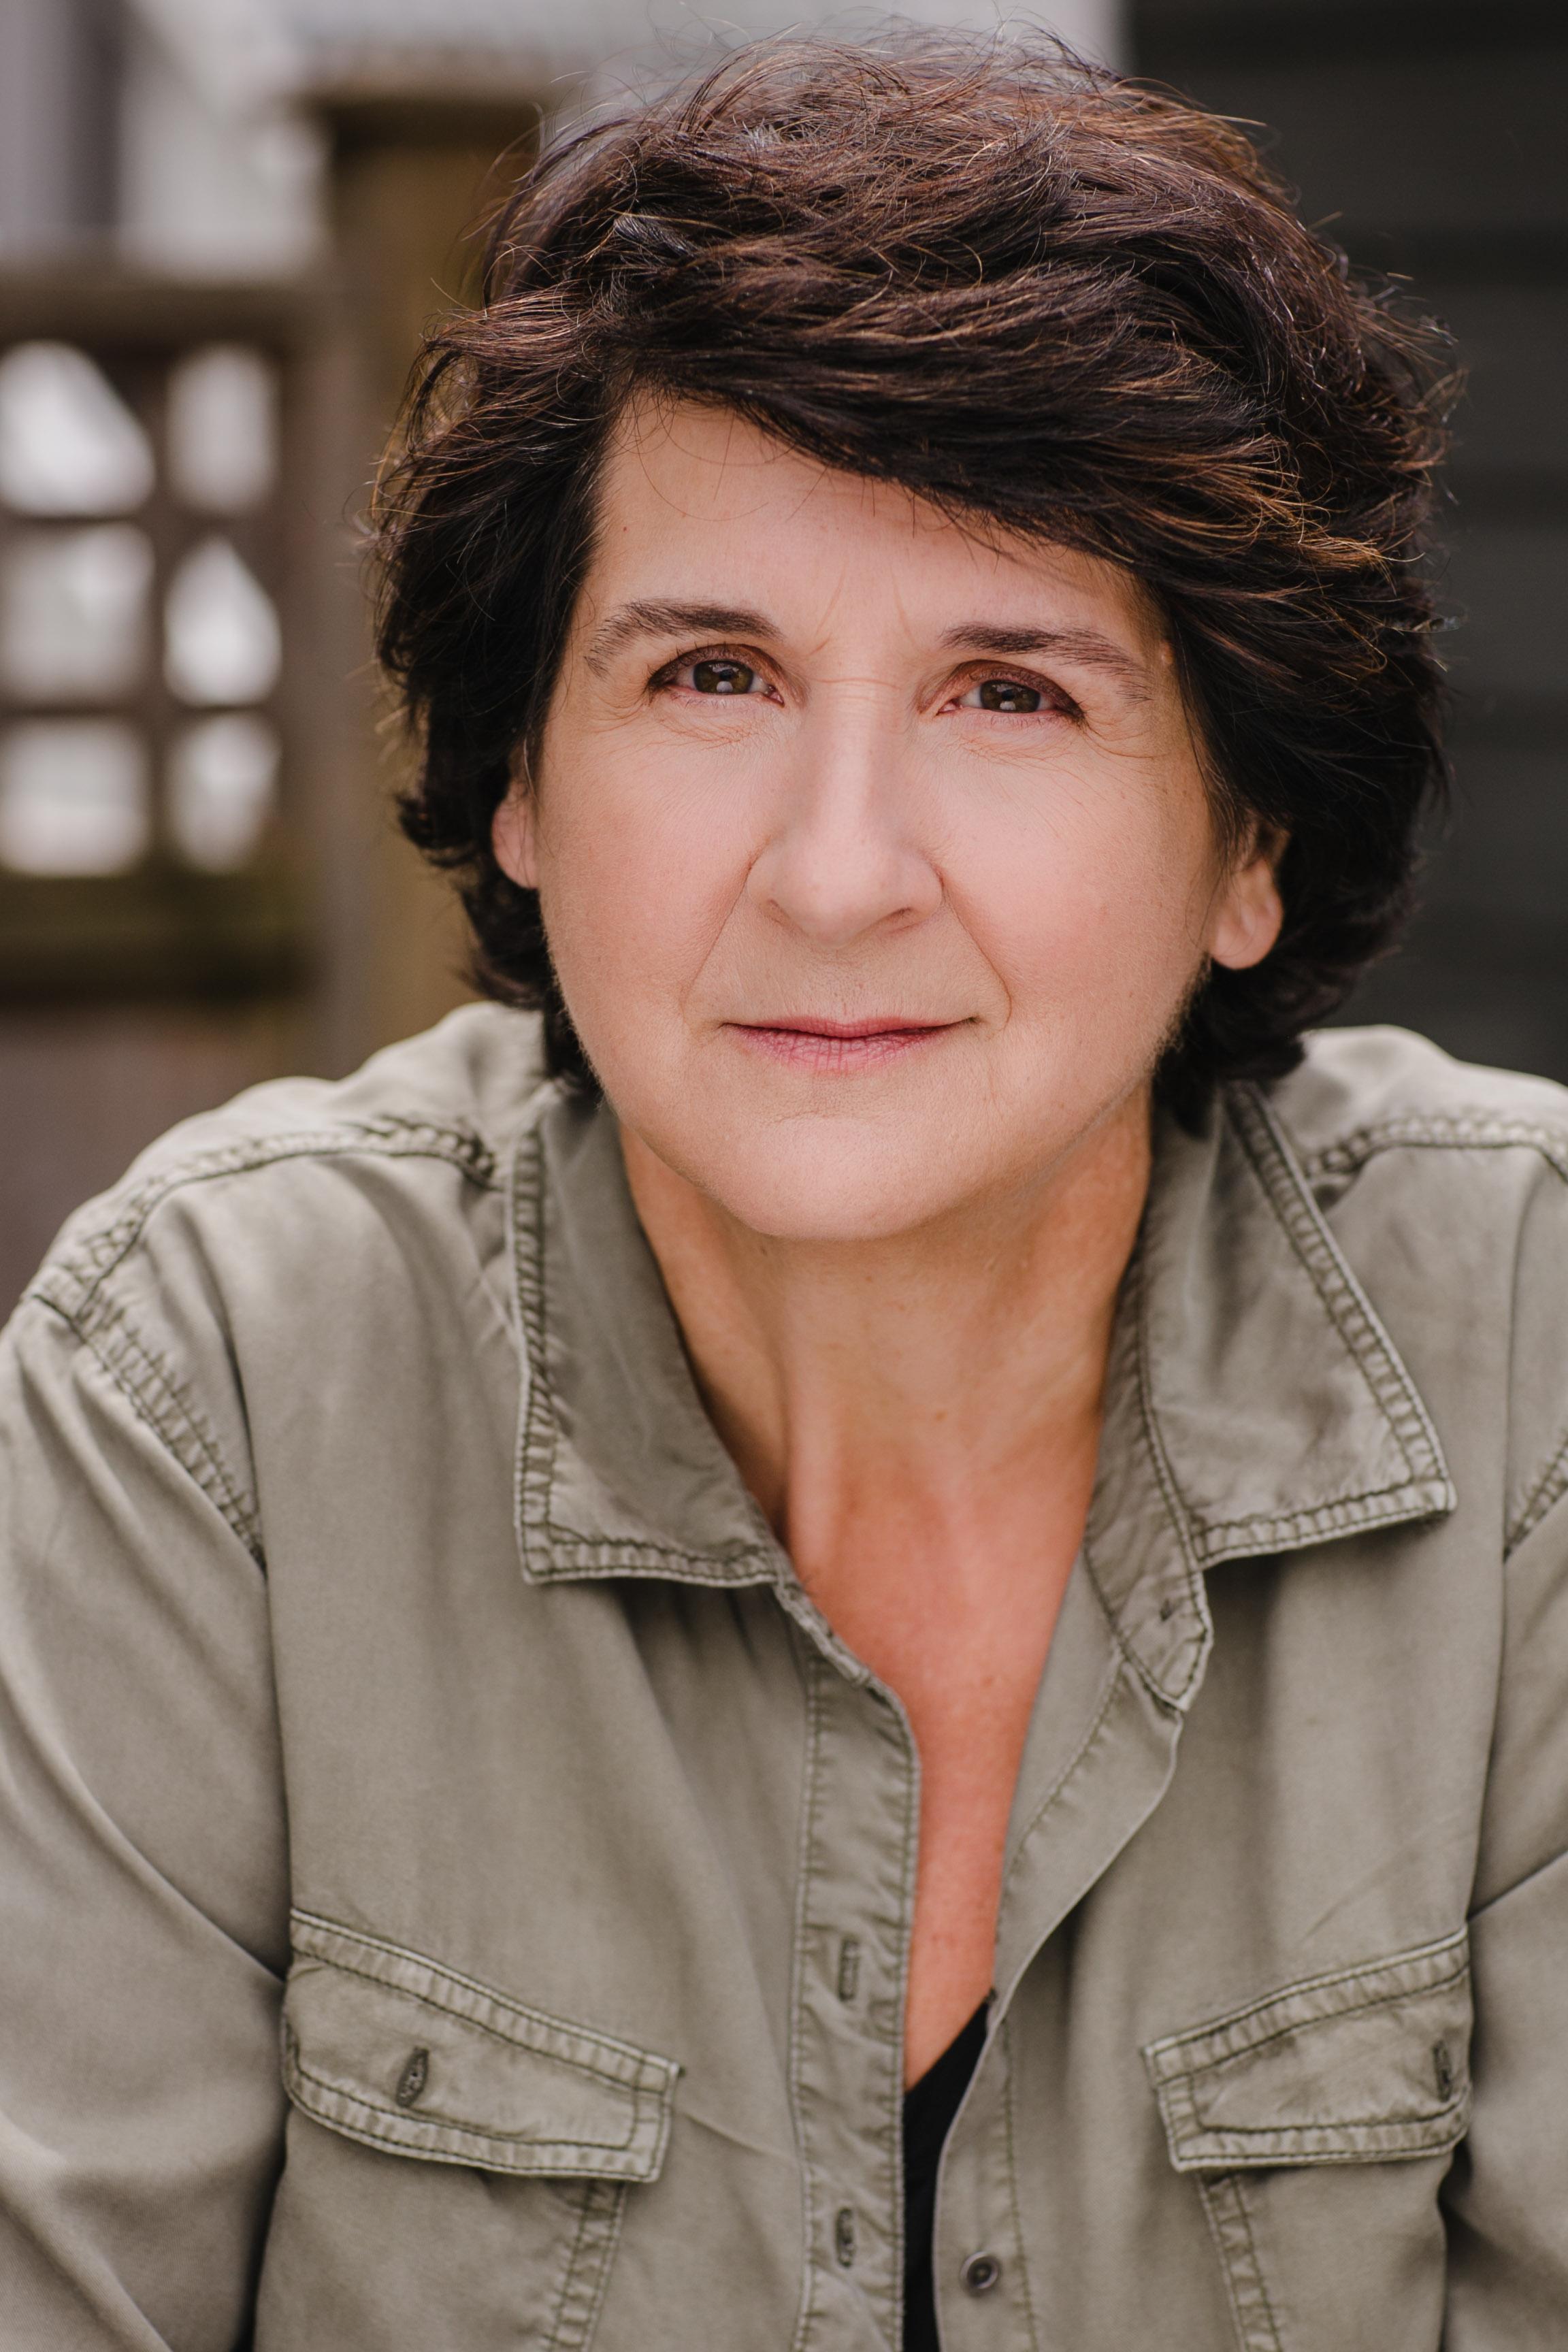 Pam Kearns as Sylvia Patrick, Martha, University Dean